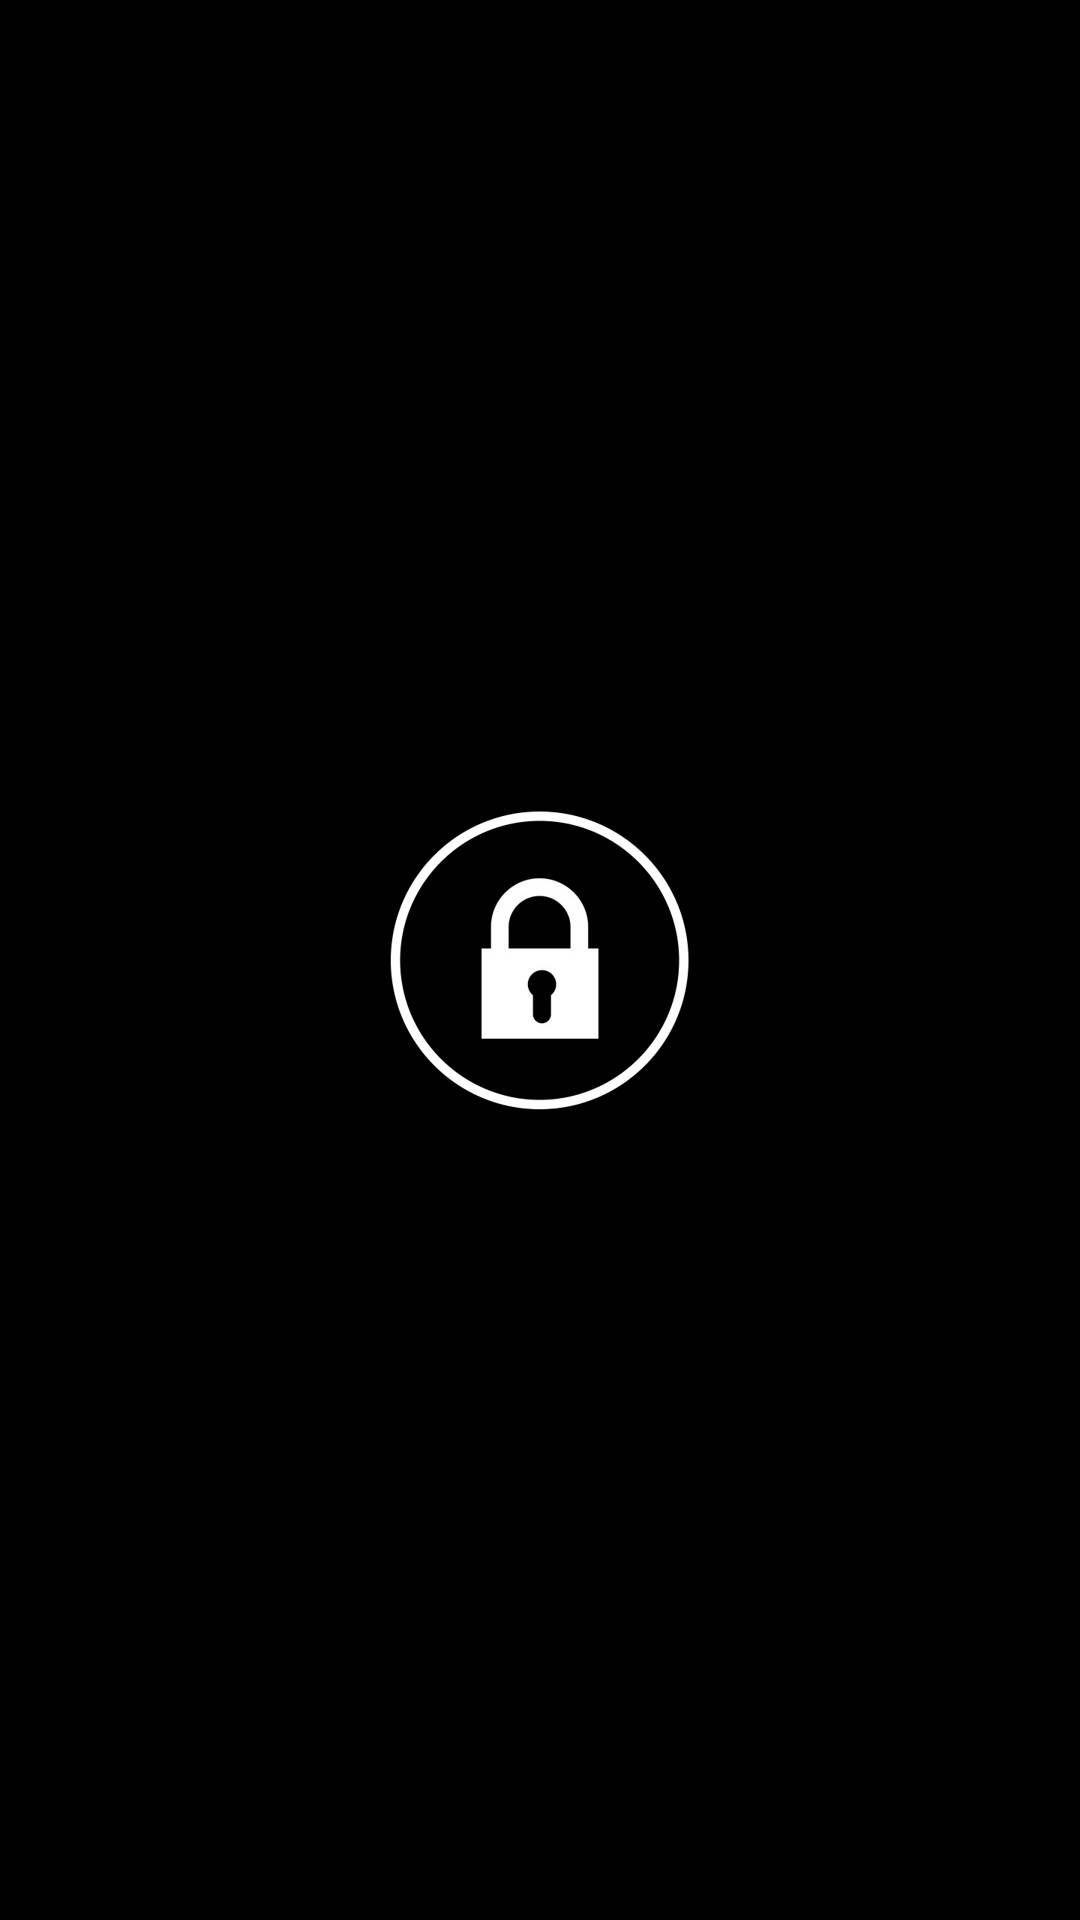 картинки на блок телефона время